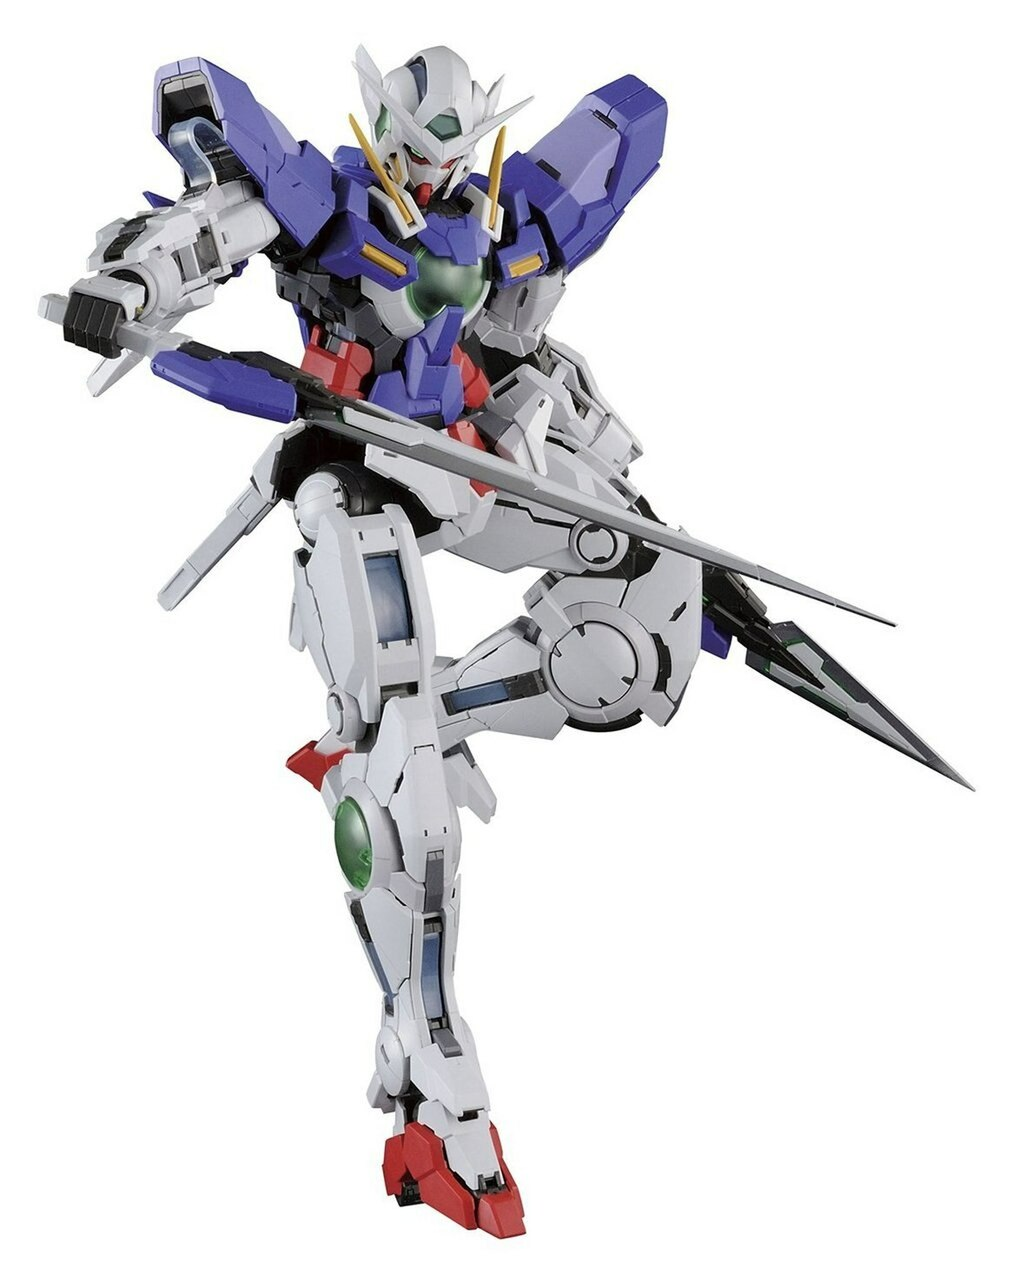 Bandai Gundam Exia Gundam 00 Bandai Pg 222249 Active Powersports